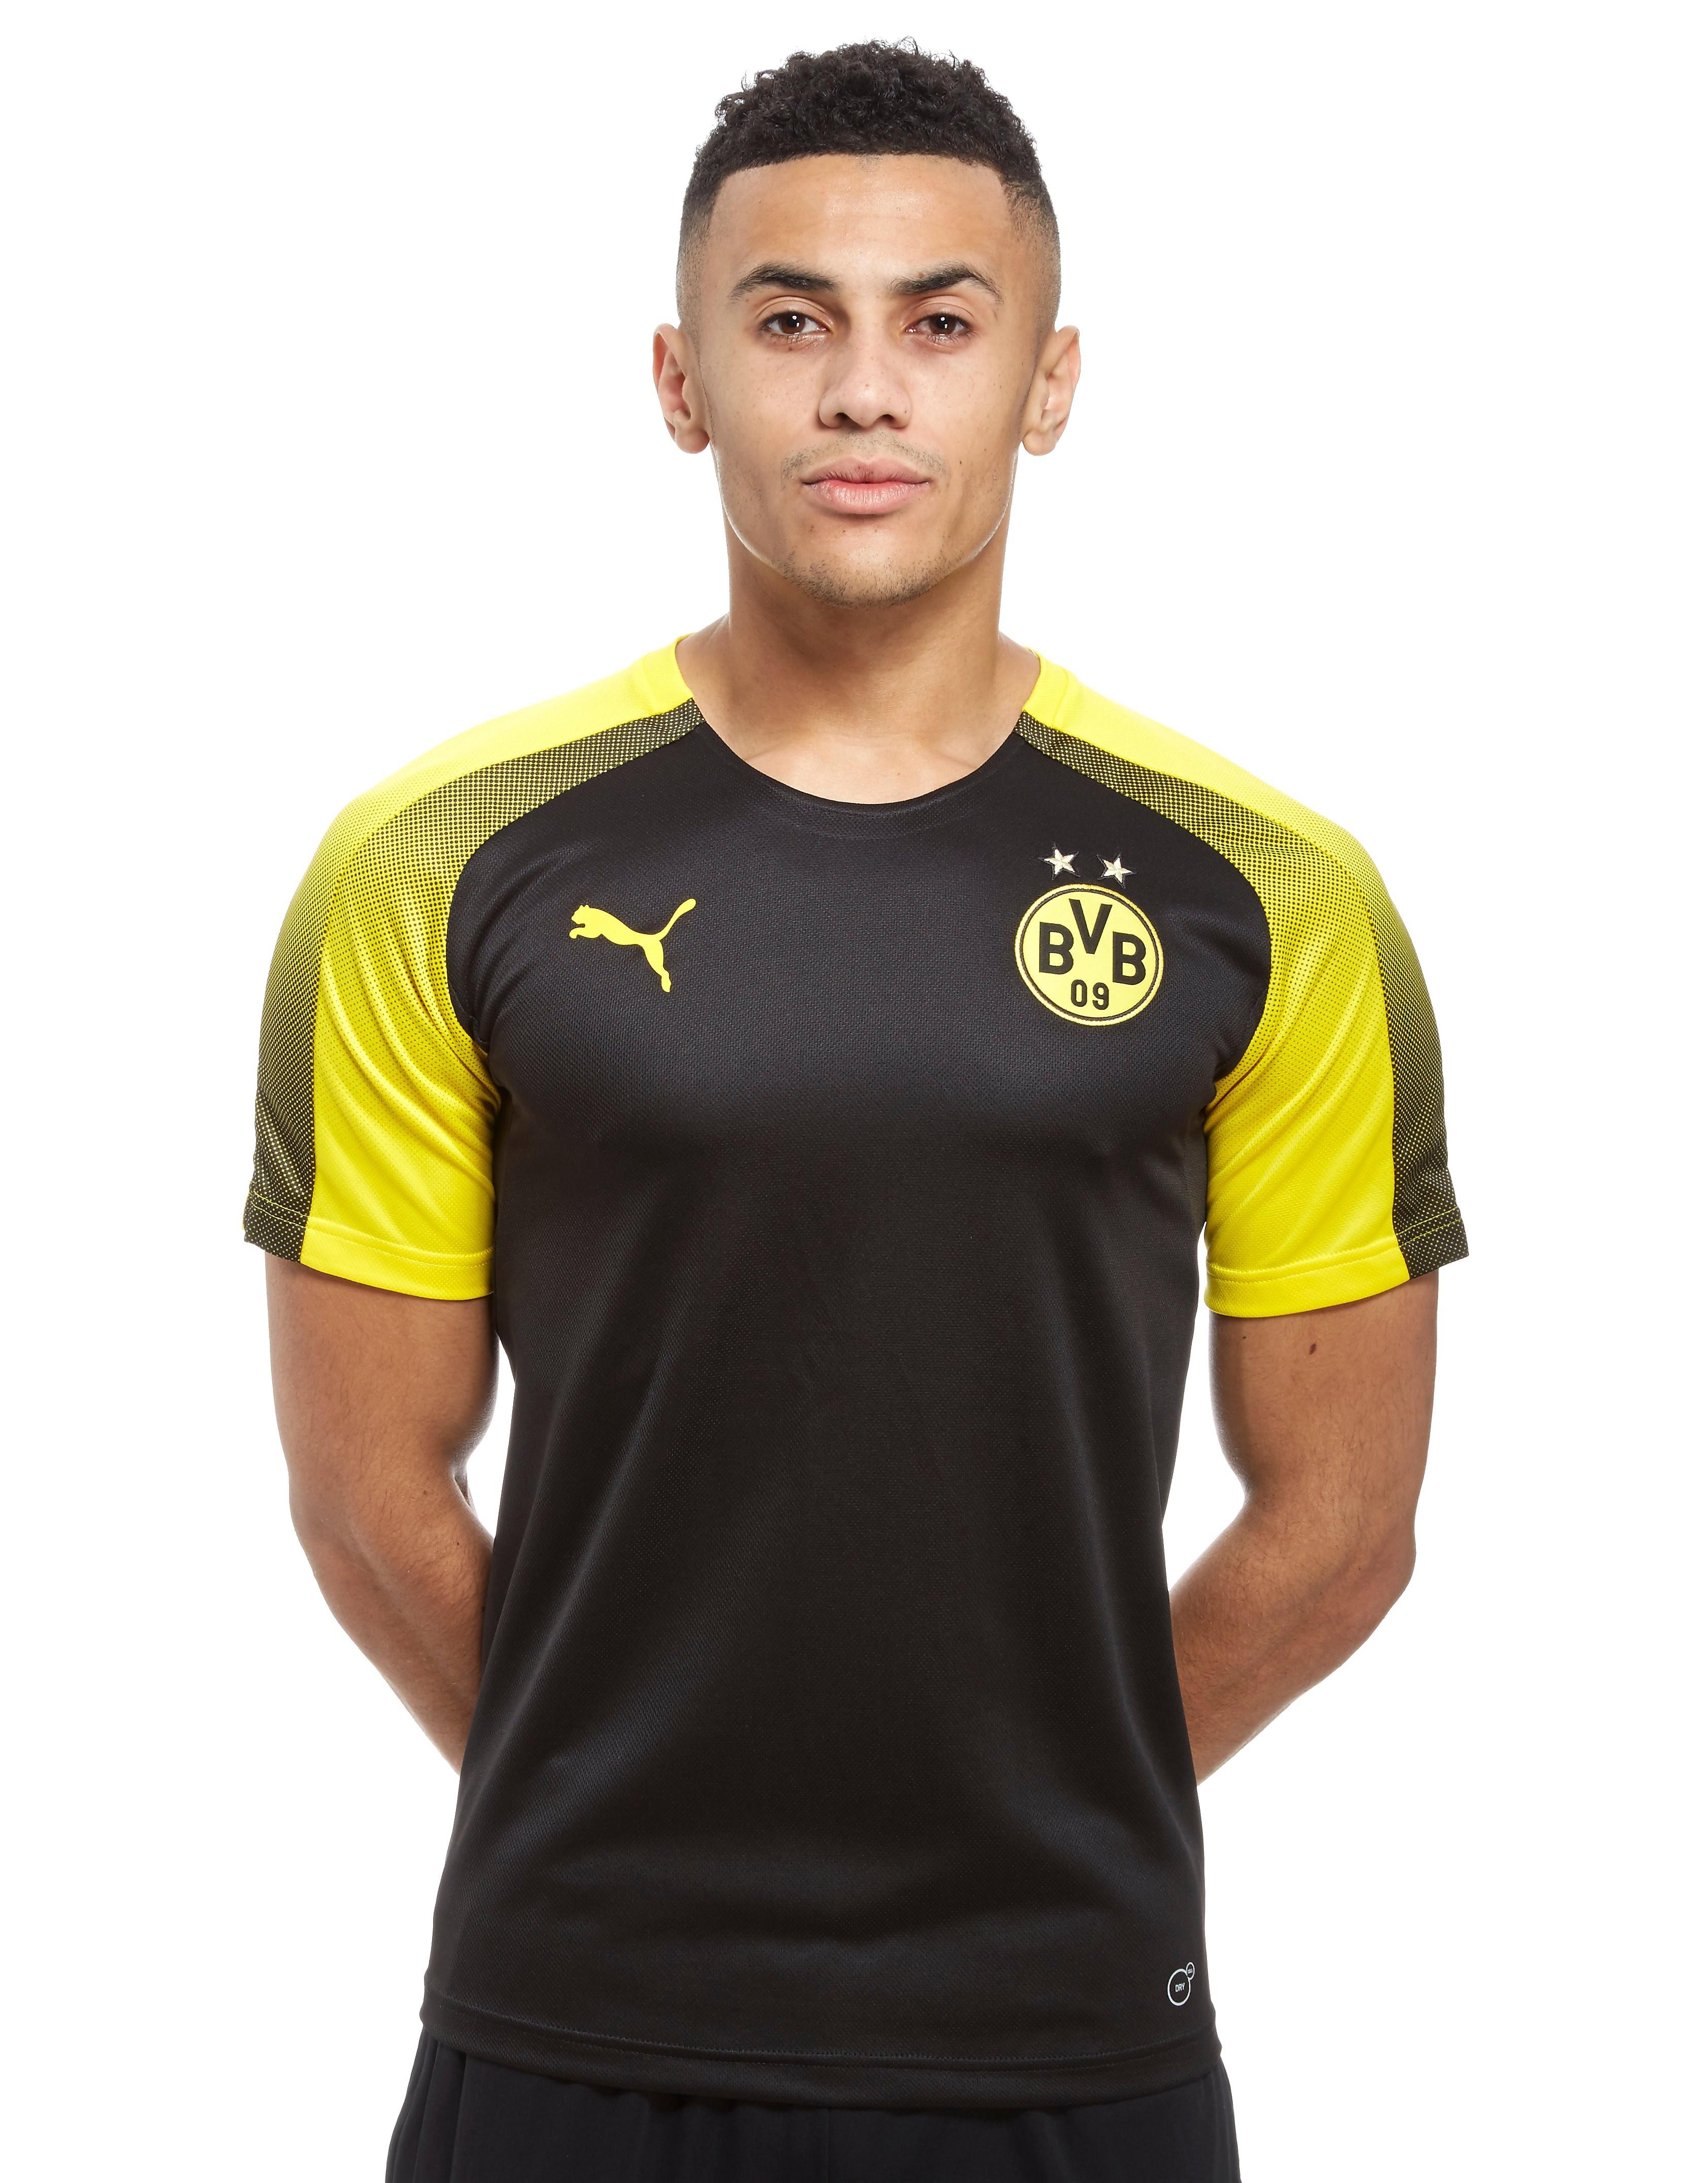 PUMA Borussia Dortmund 2017/18 Stadium Shirt